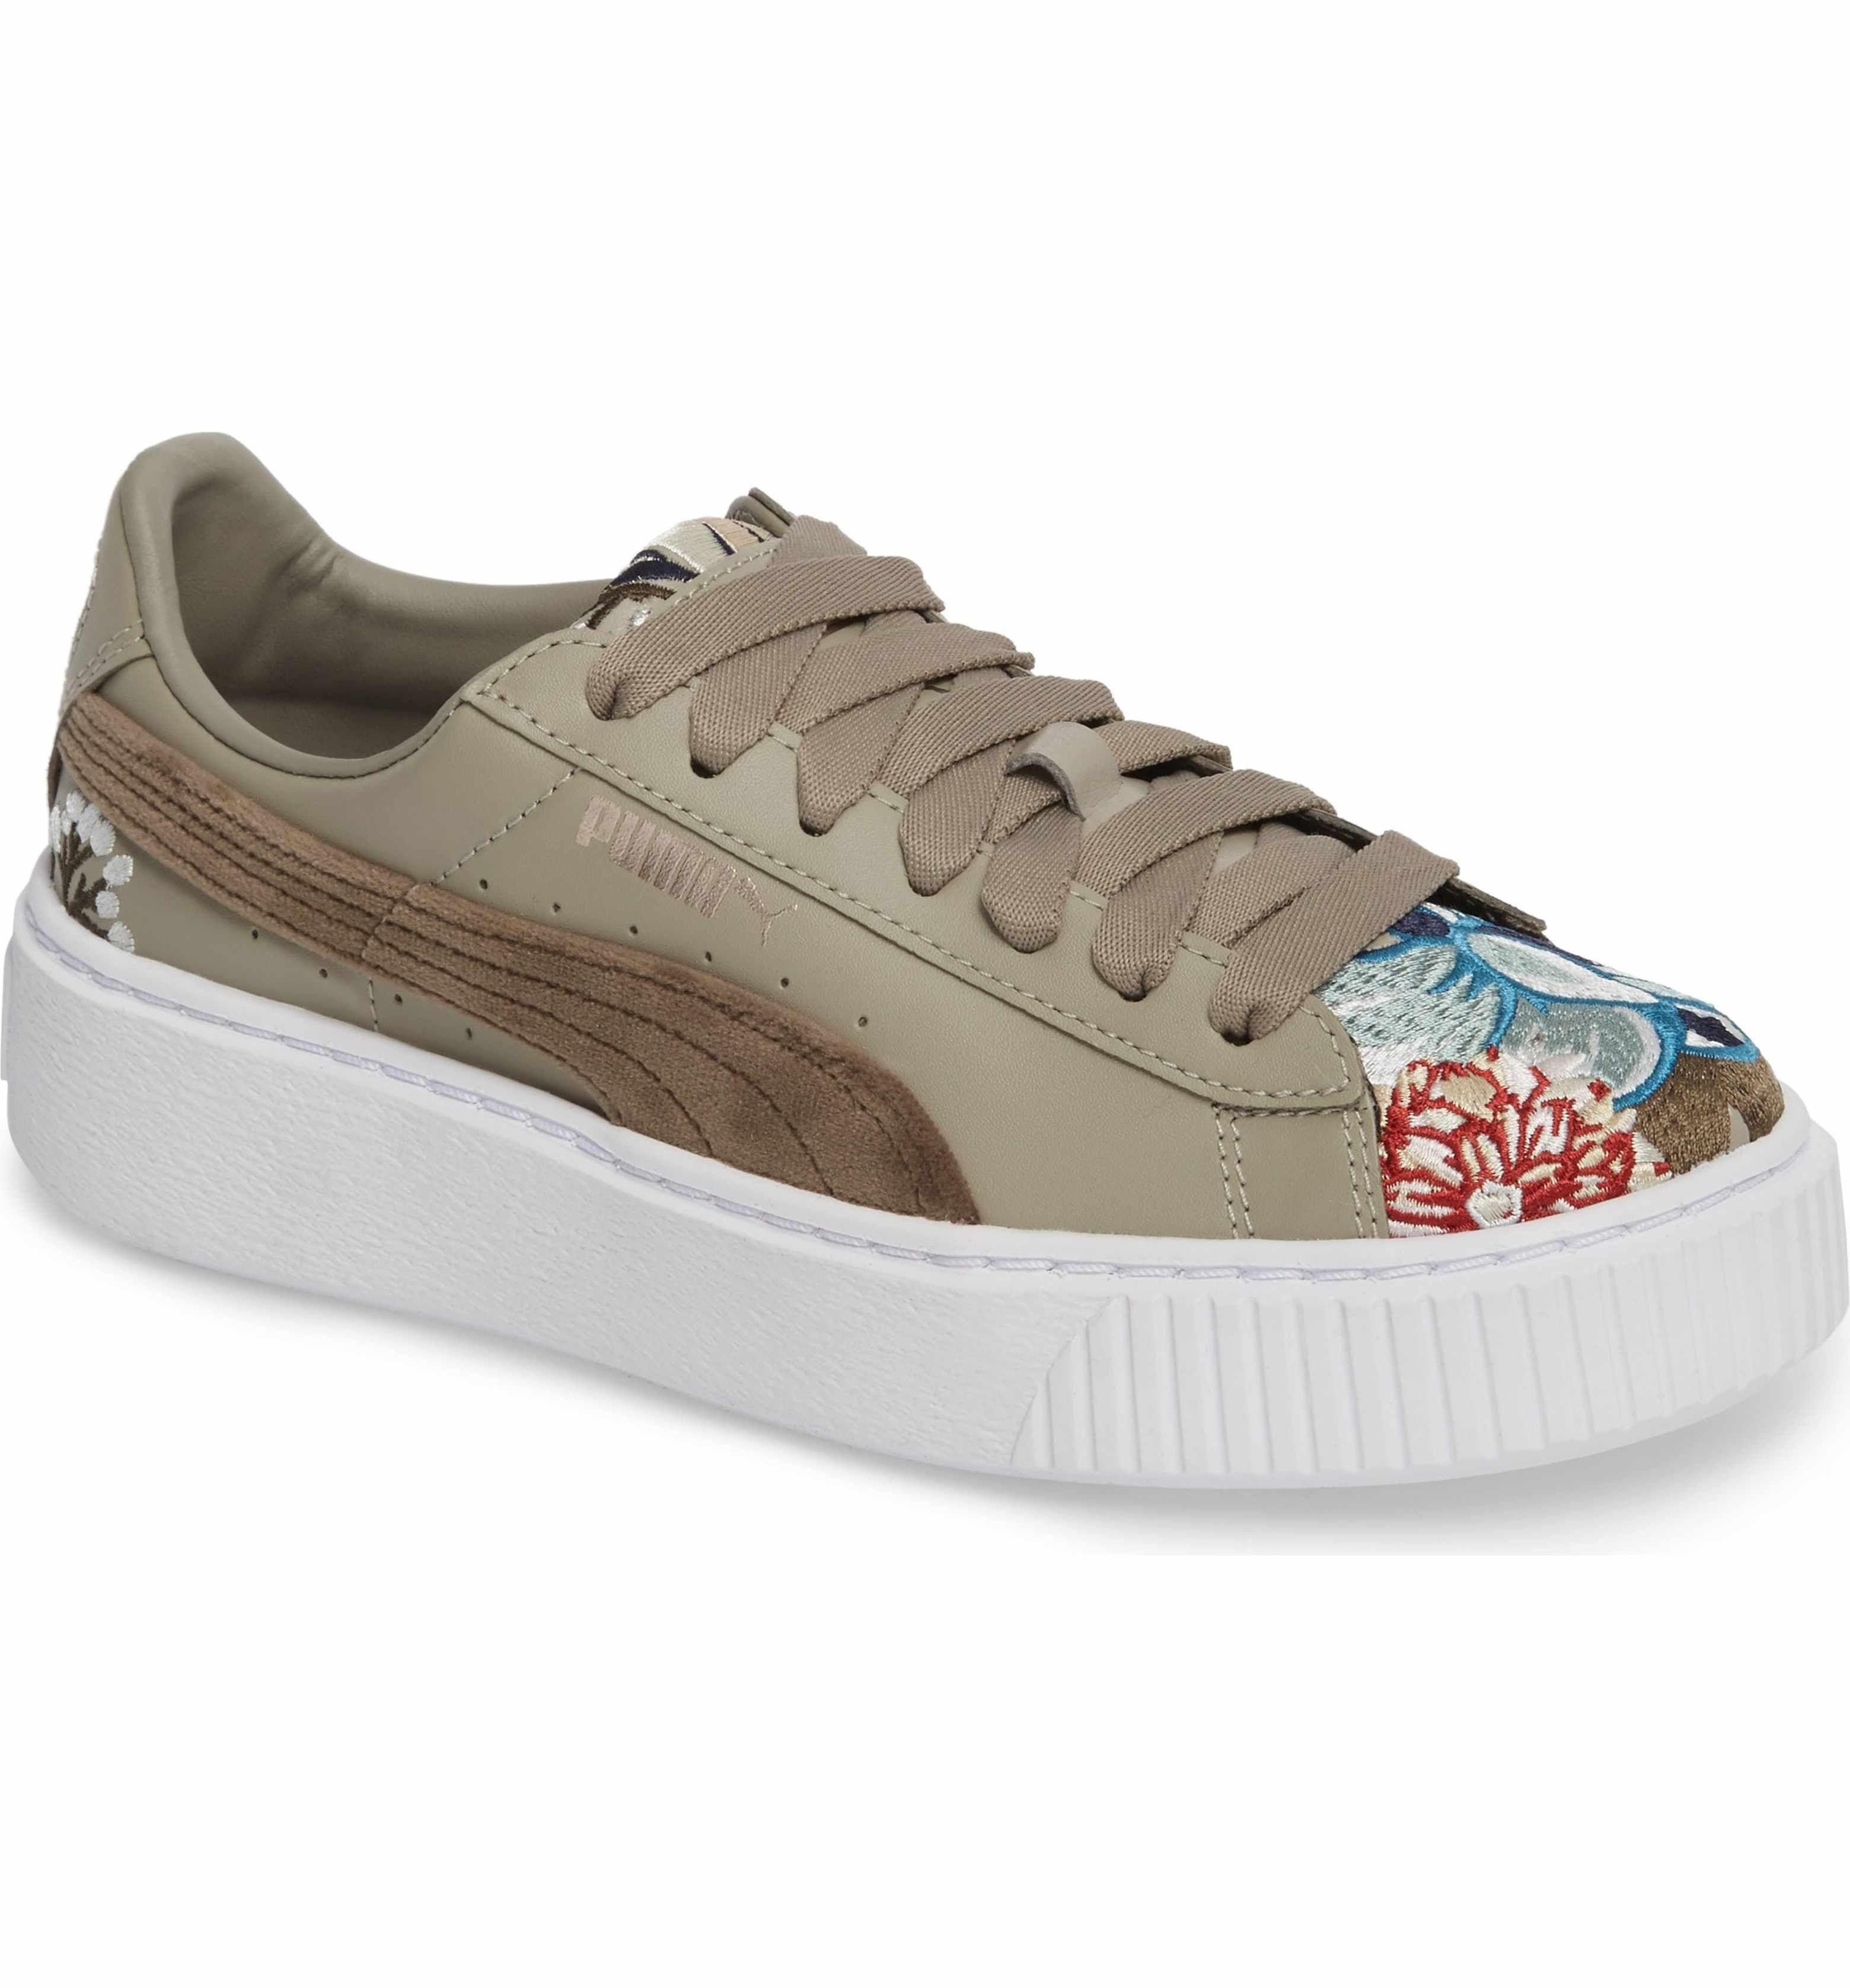 Main Image - PUMA Platform Hyper Embroidered Sneaker (Women)